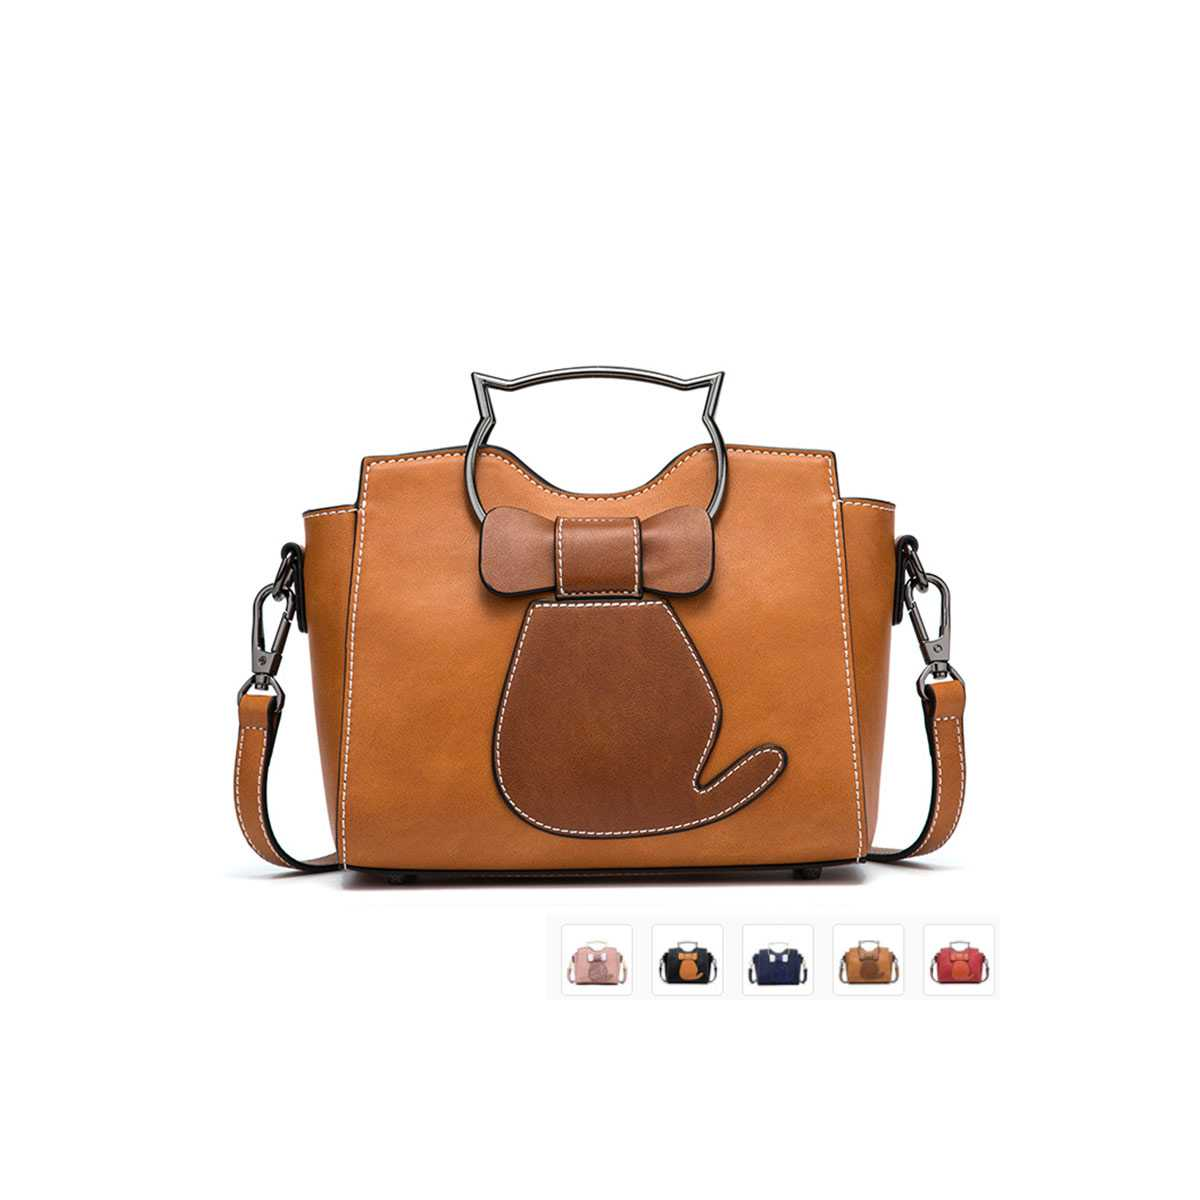 Bow Tie Cat PU Leather Ladies Handbag - CatsPlay Superstore 8c3f3bc296658